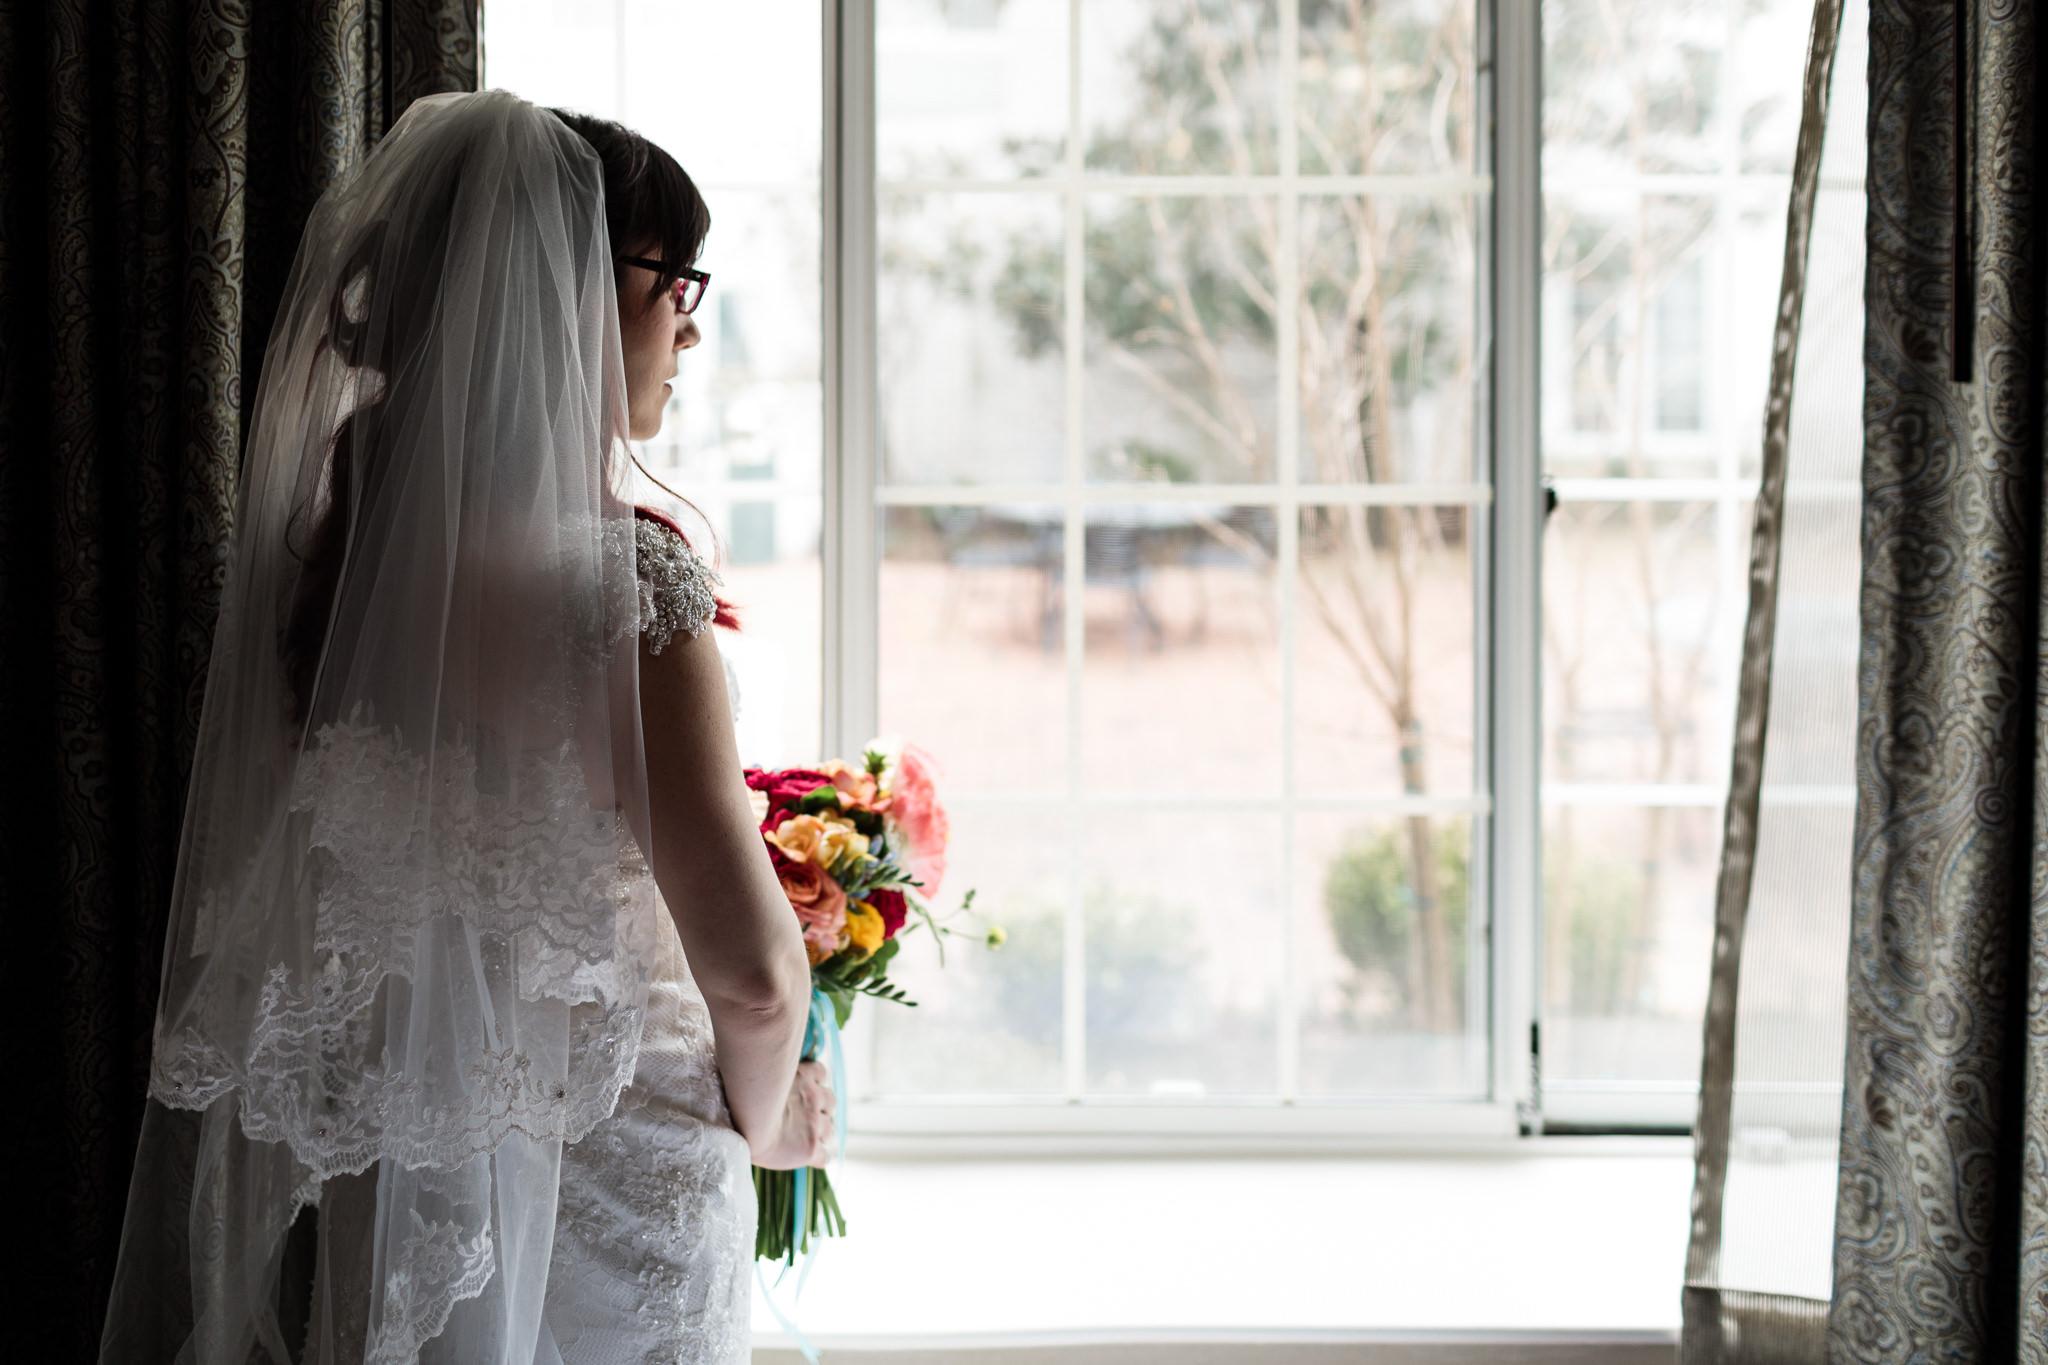 Hanchar_Madison_Hotel_NJ_Wedding_7R5A8176-Edit.jpg